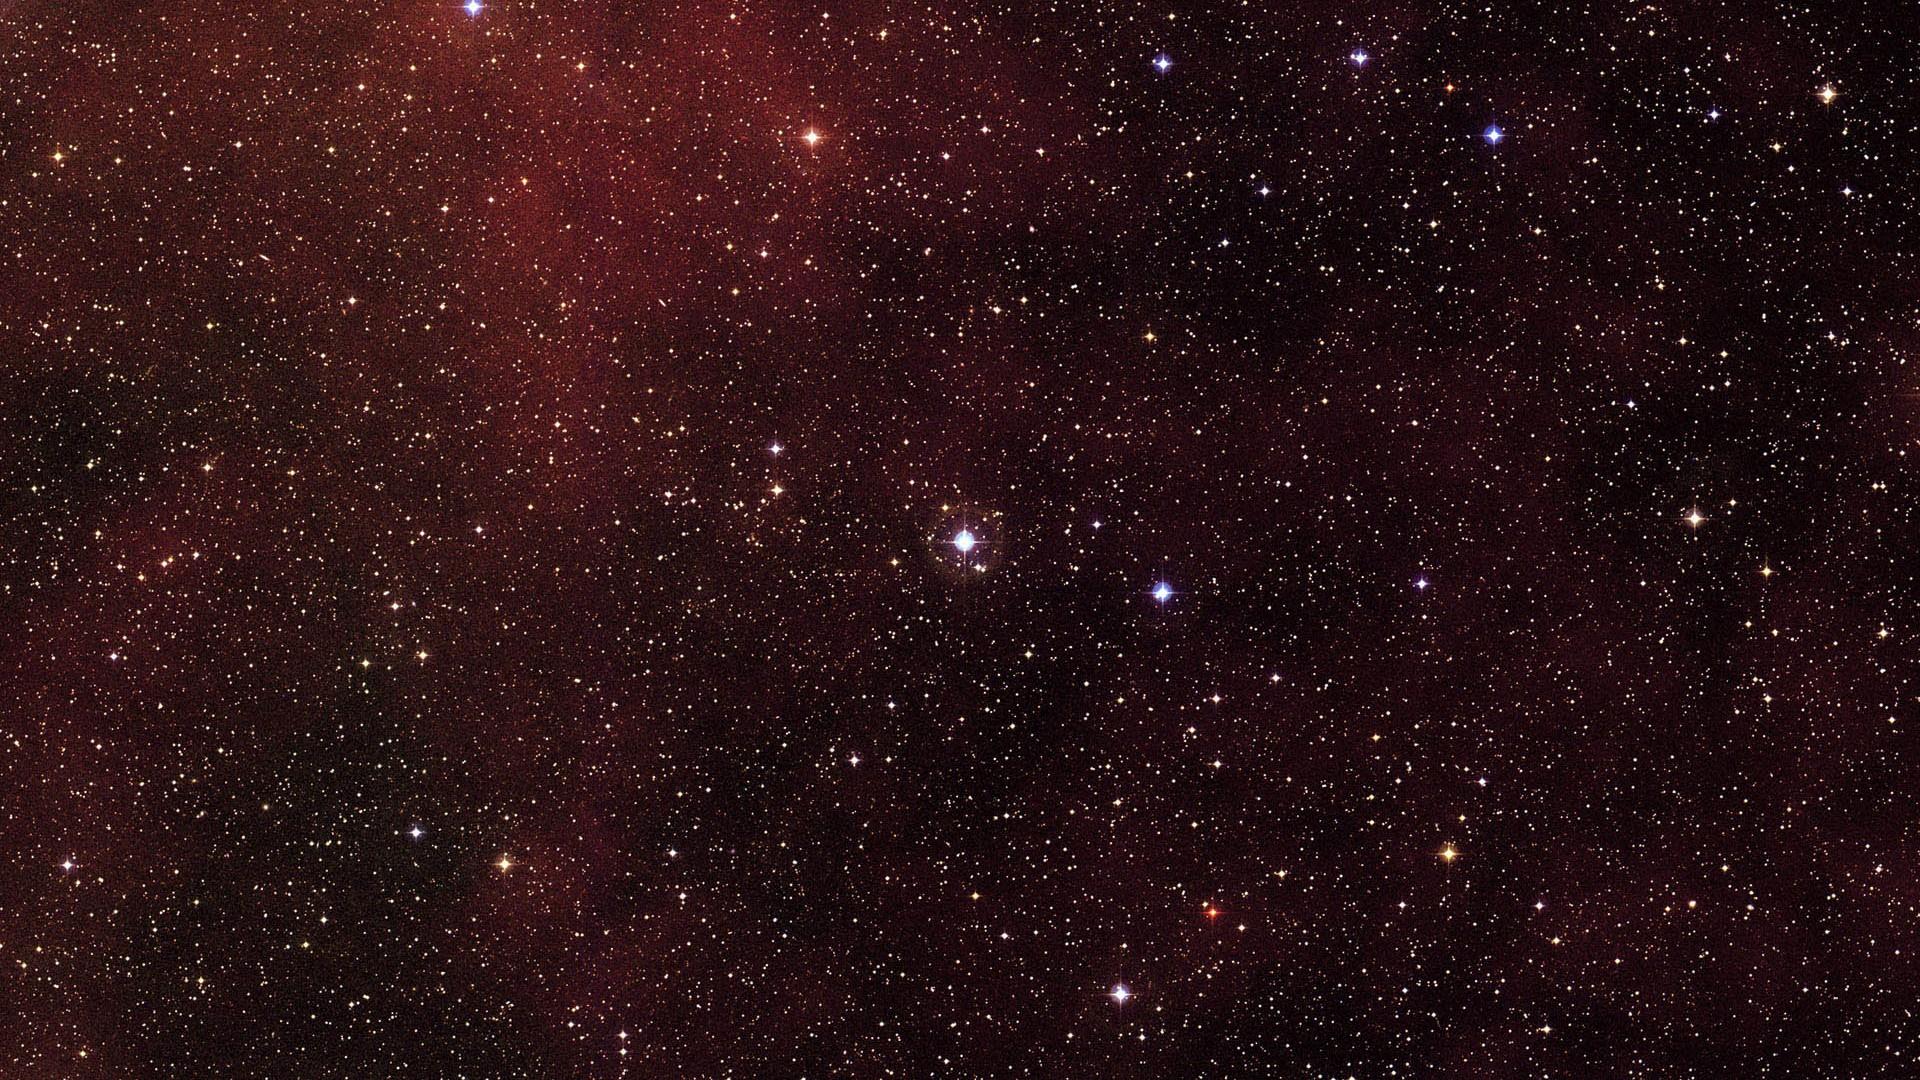 hubble star wallpaper 10 1920x1080 wallpaper download